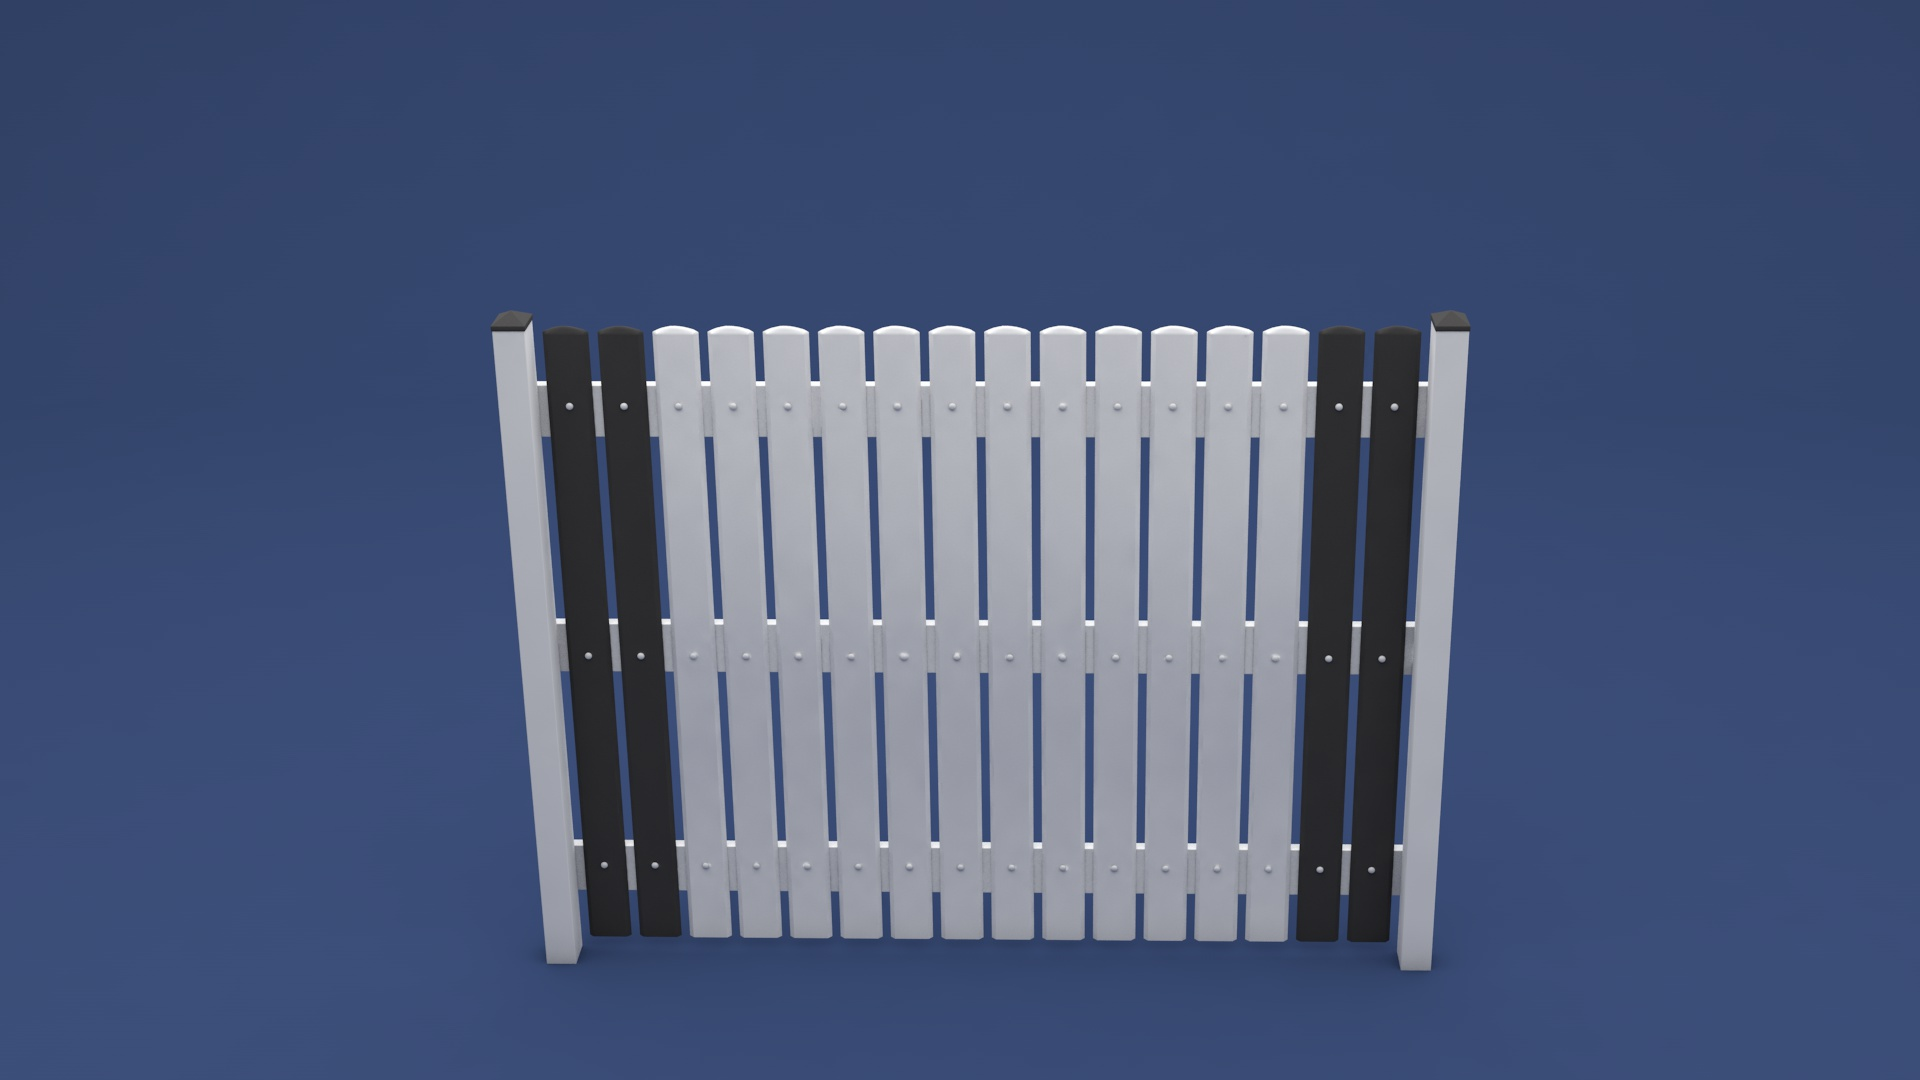 Kunststoff Zaun Victor in 2000 x 1600 mm aus langlebigen Kunststoff